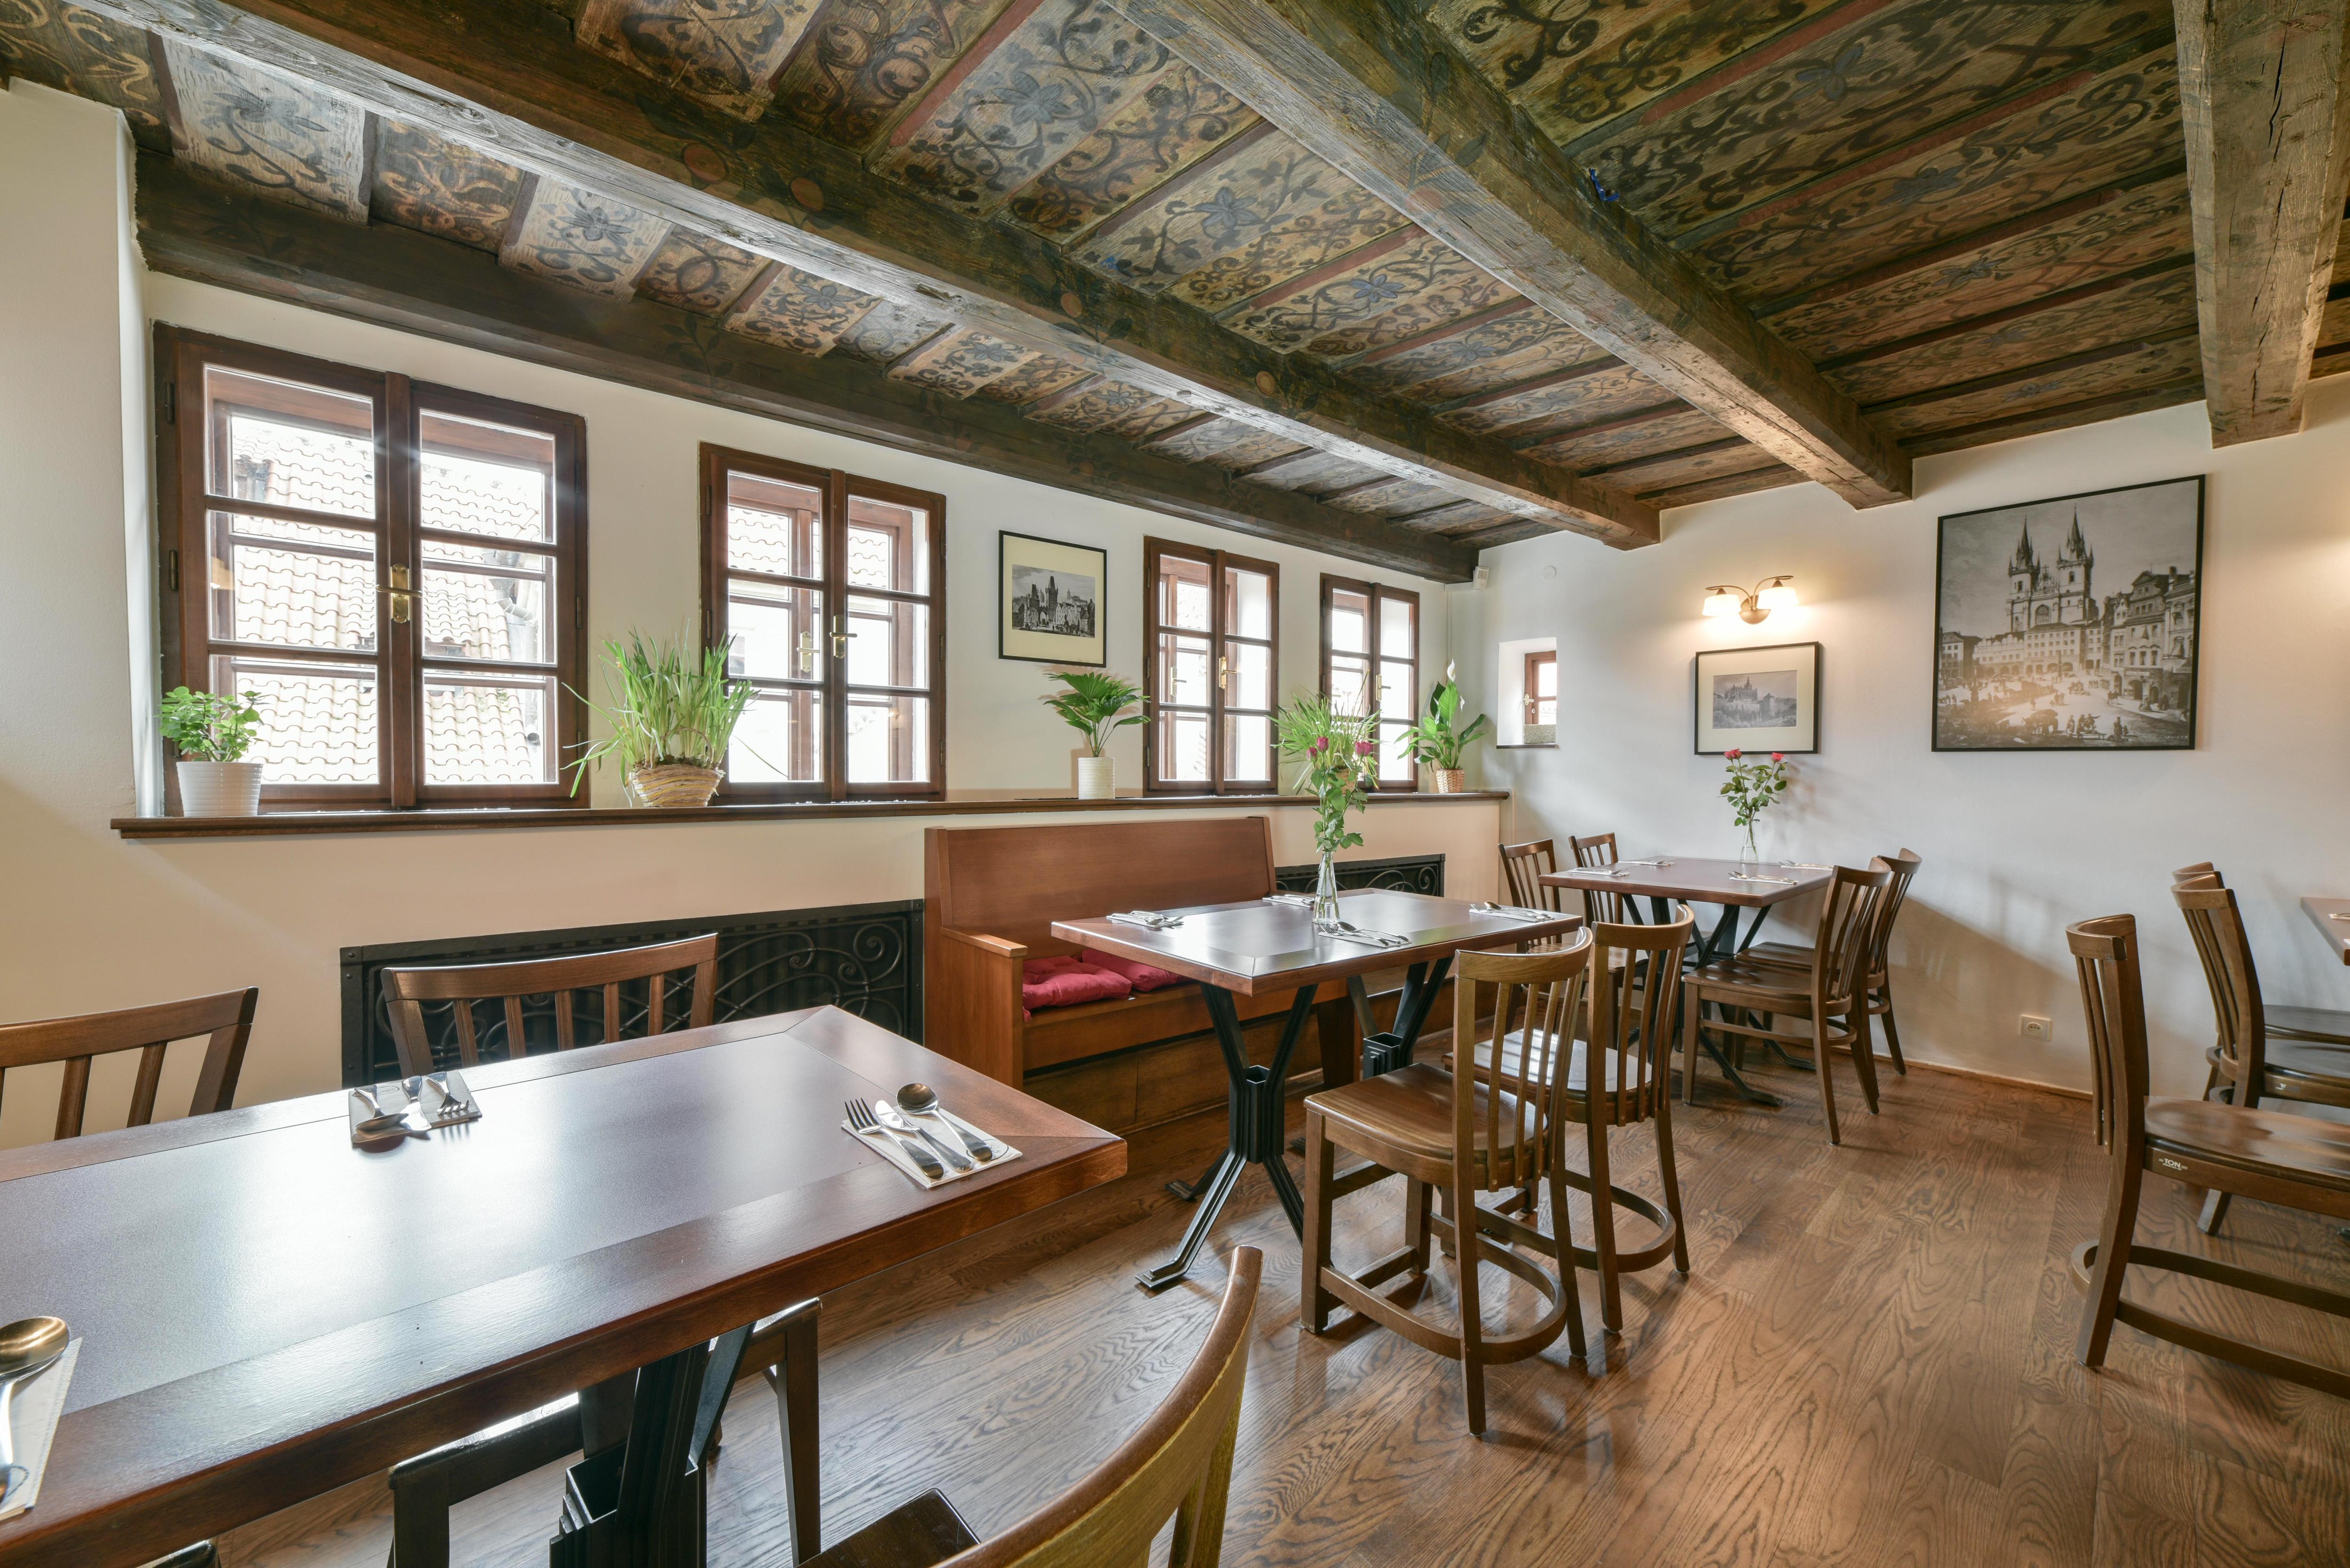 The 10 Best Vegetarian And Vegan Restaurants In Prague